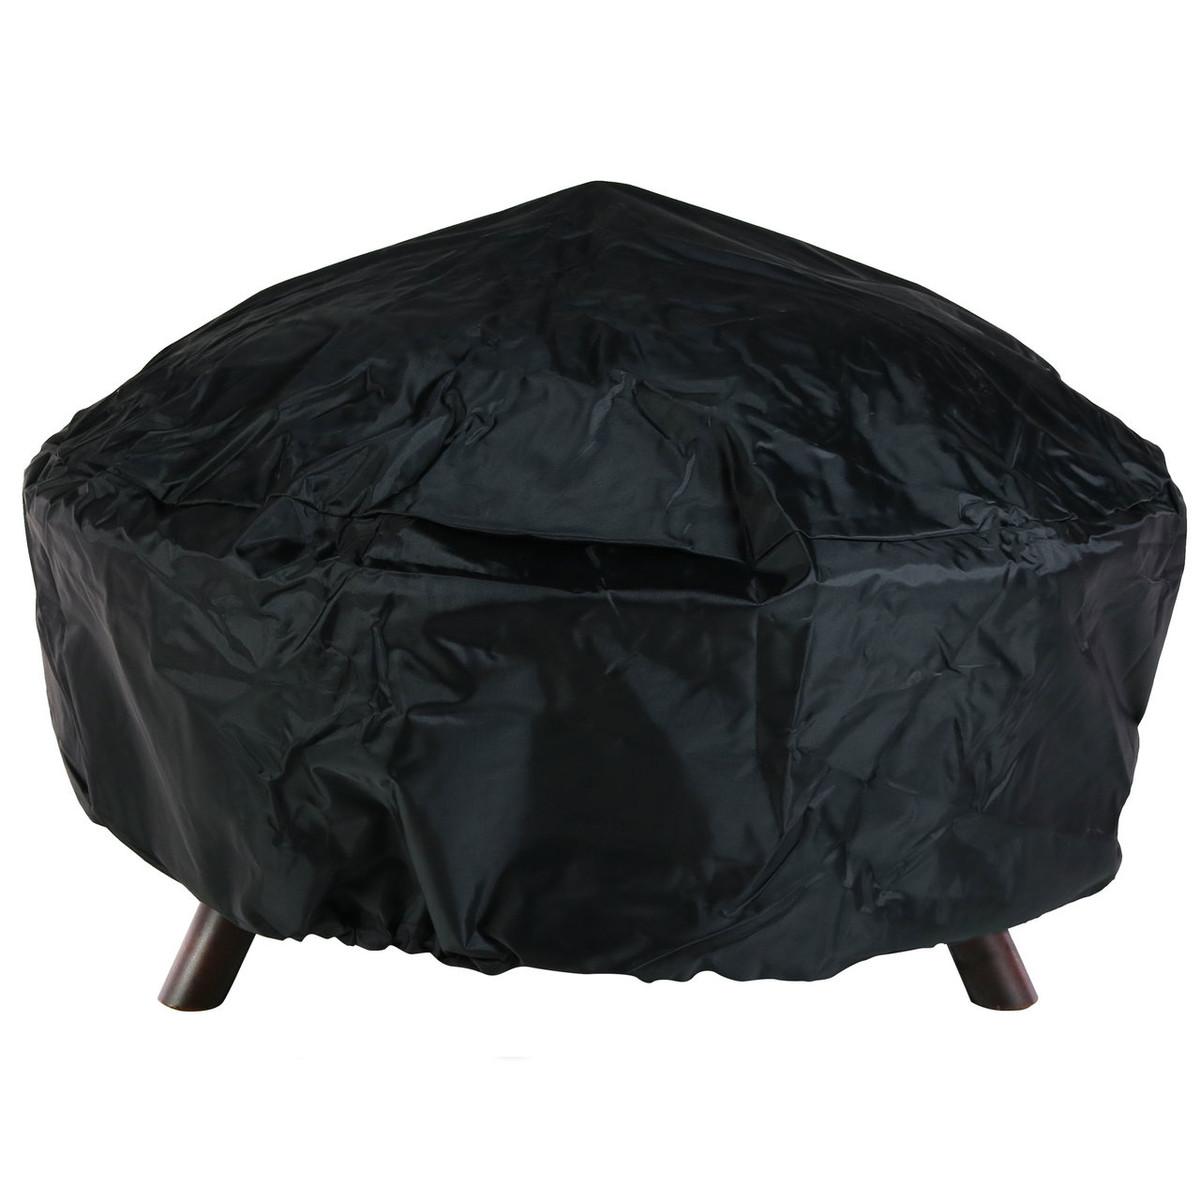 Pleasing Sunnydaze Black Crossweave Fire Bowl Fire Pit Fire Pits Uwap Interior Chair Design Uwaporg